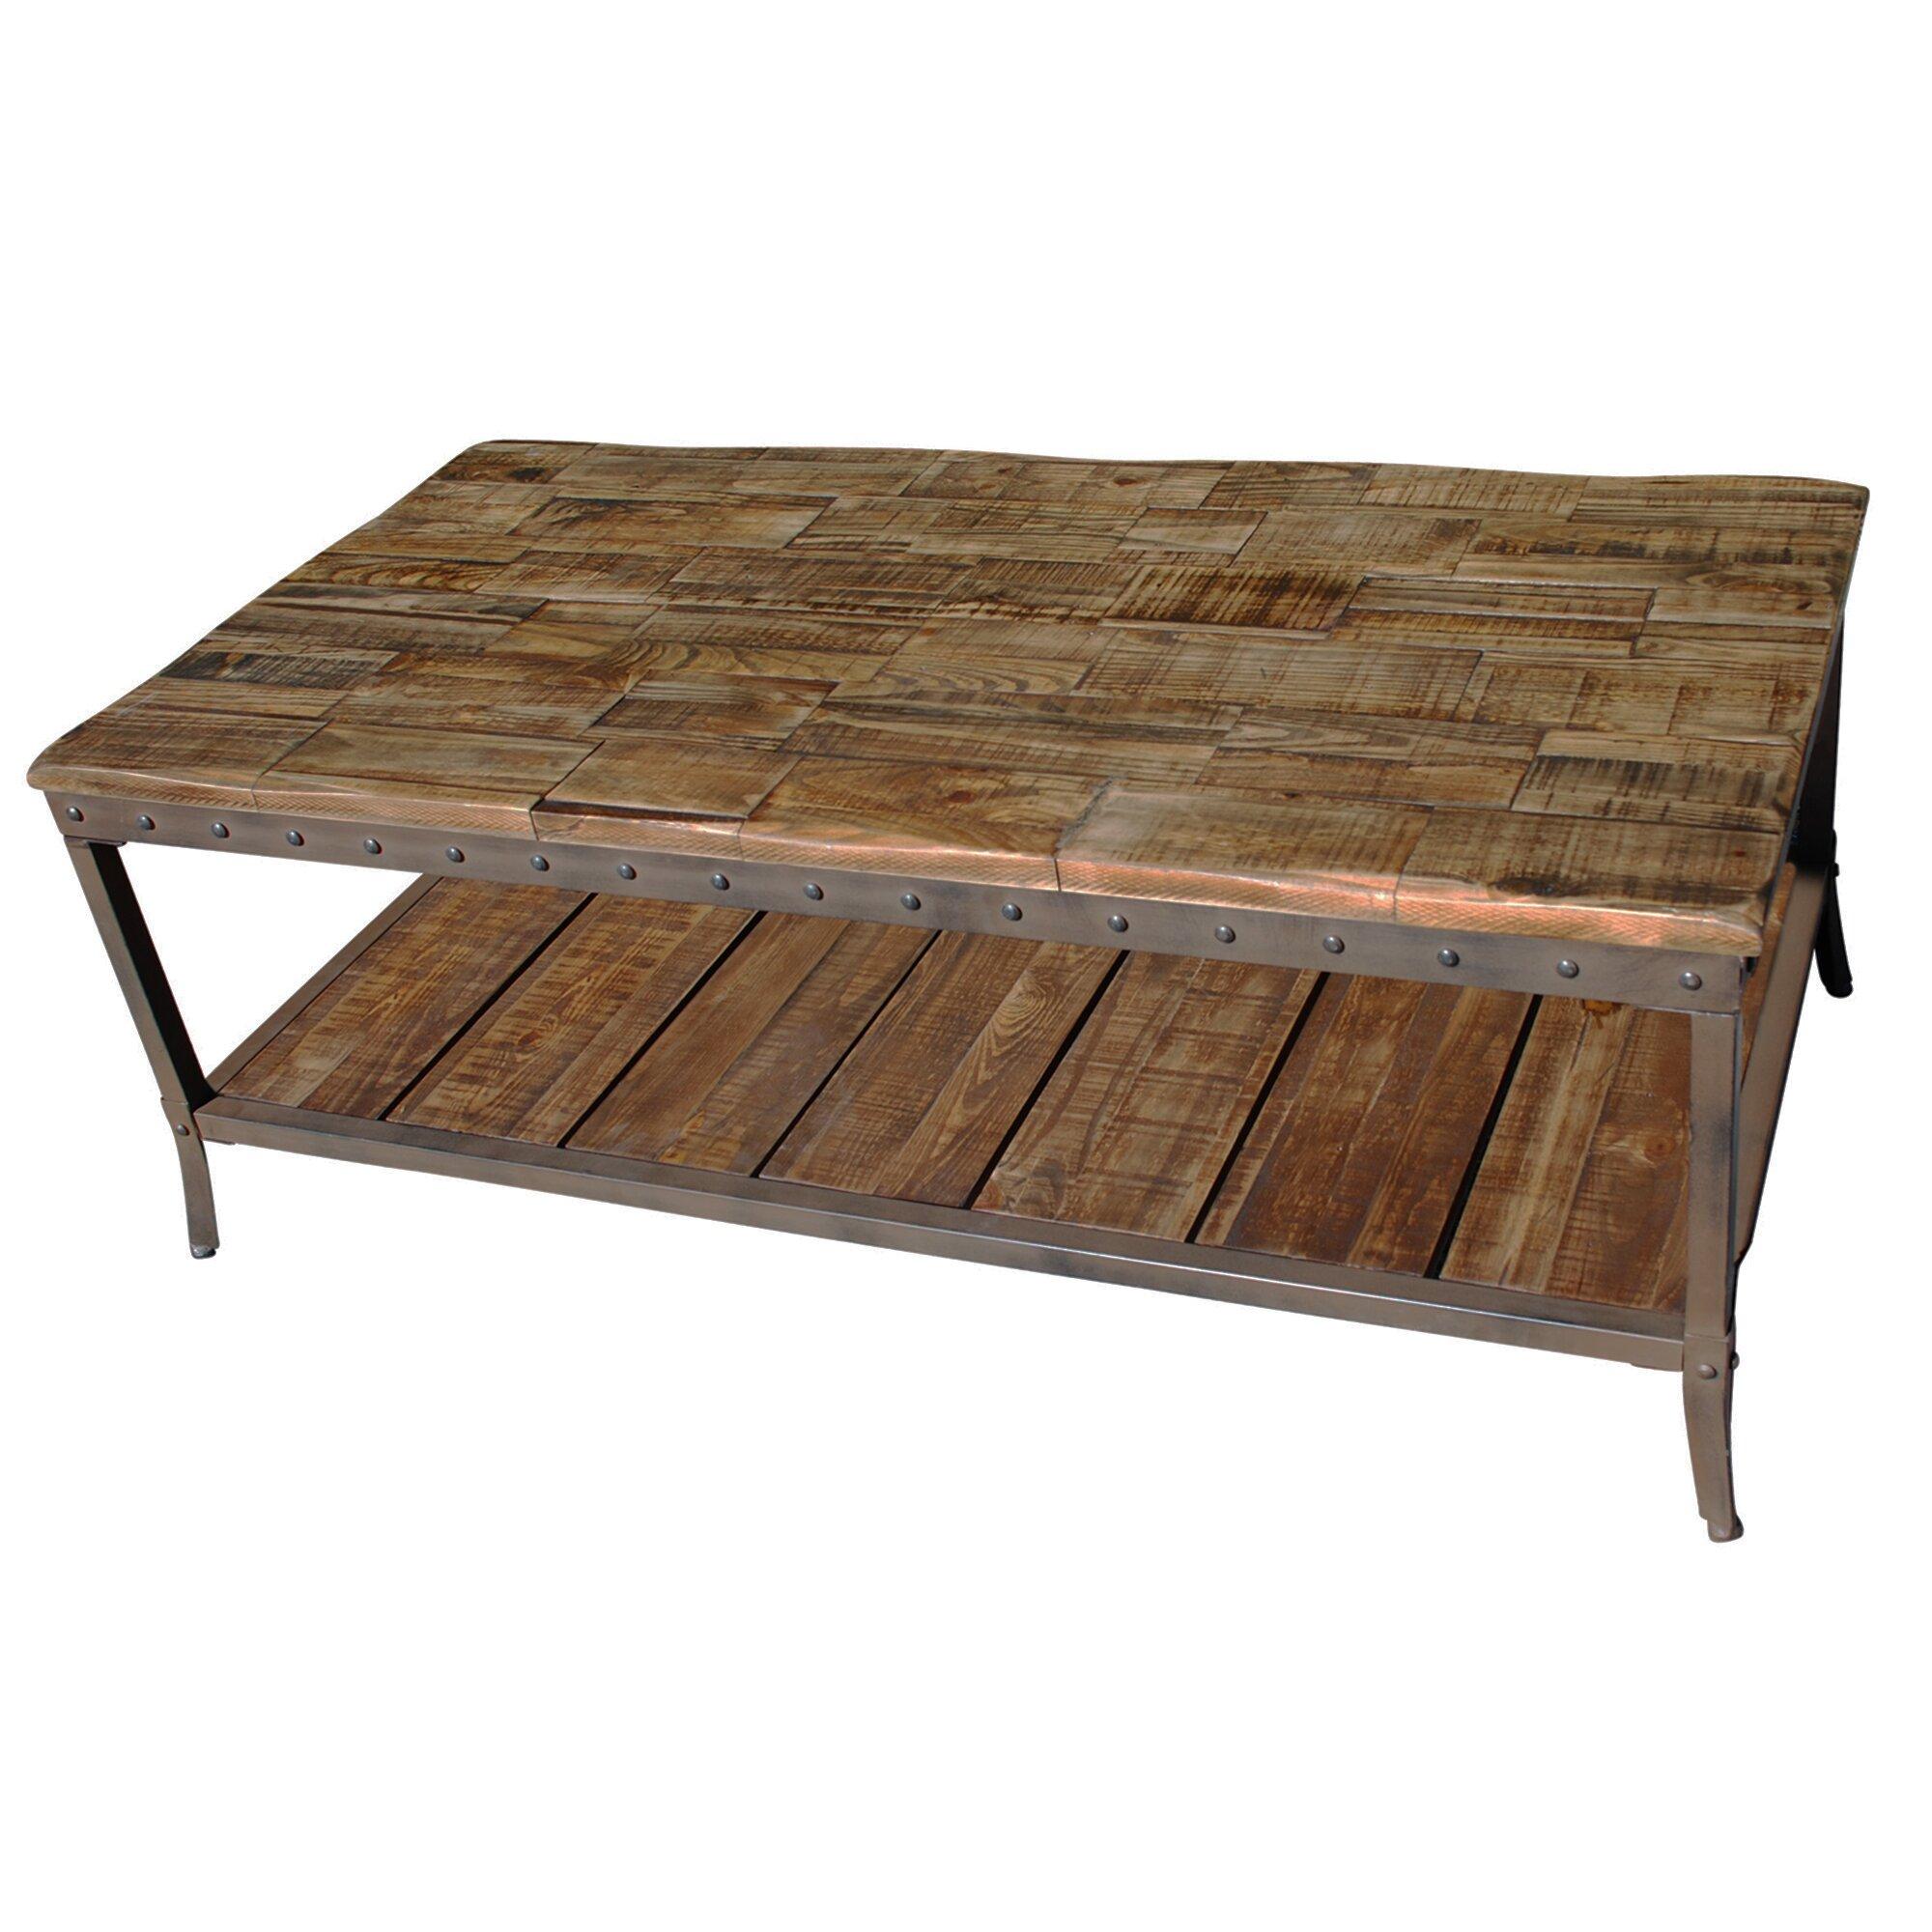 Wayfair Table: !nspire Coffee Table & Reviews